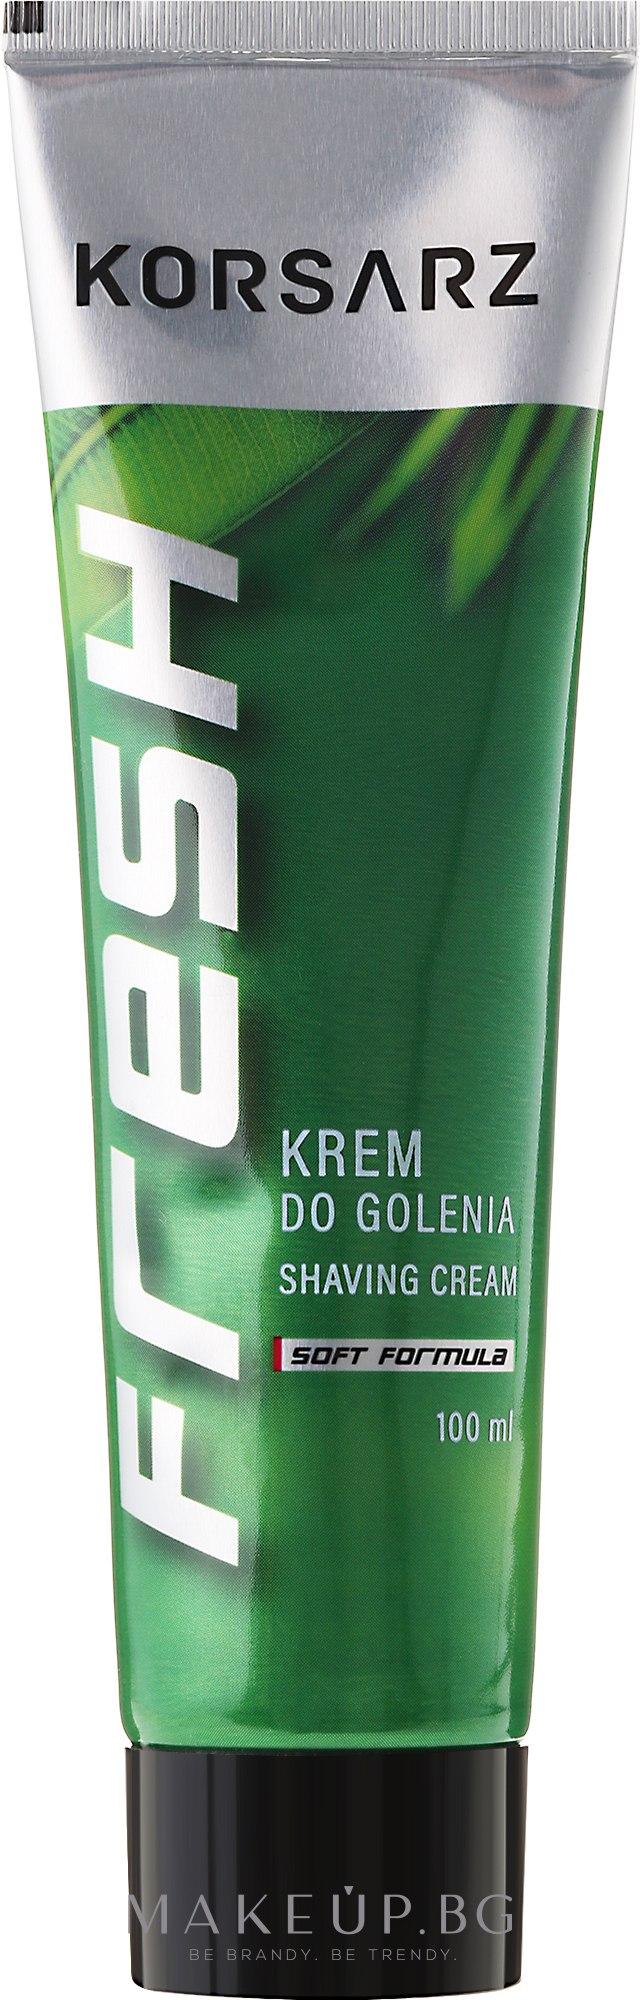 Крем за бръснене - Korsarz Shaving Cream — снимка 100 ml